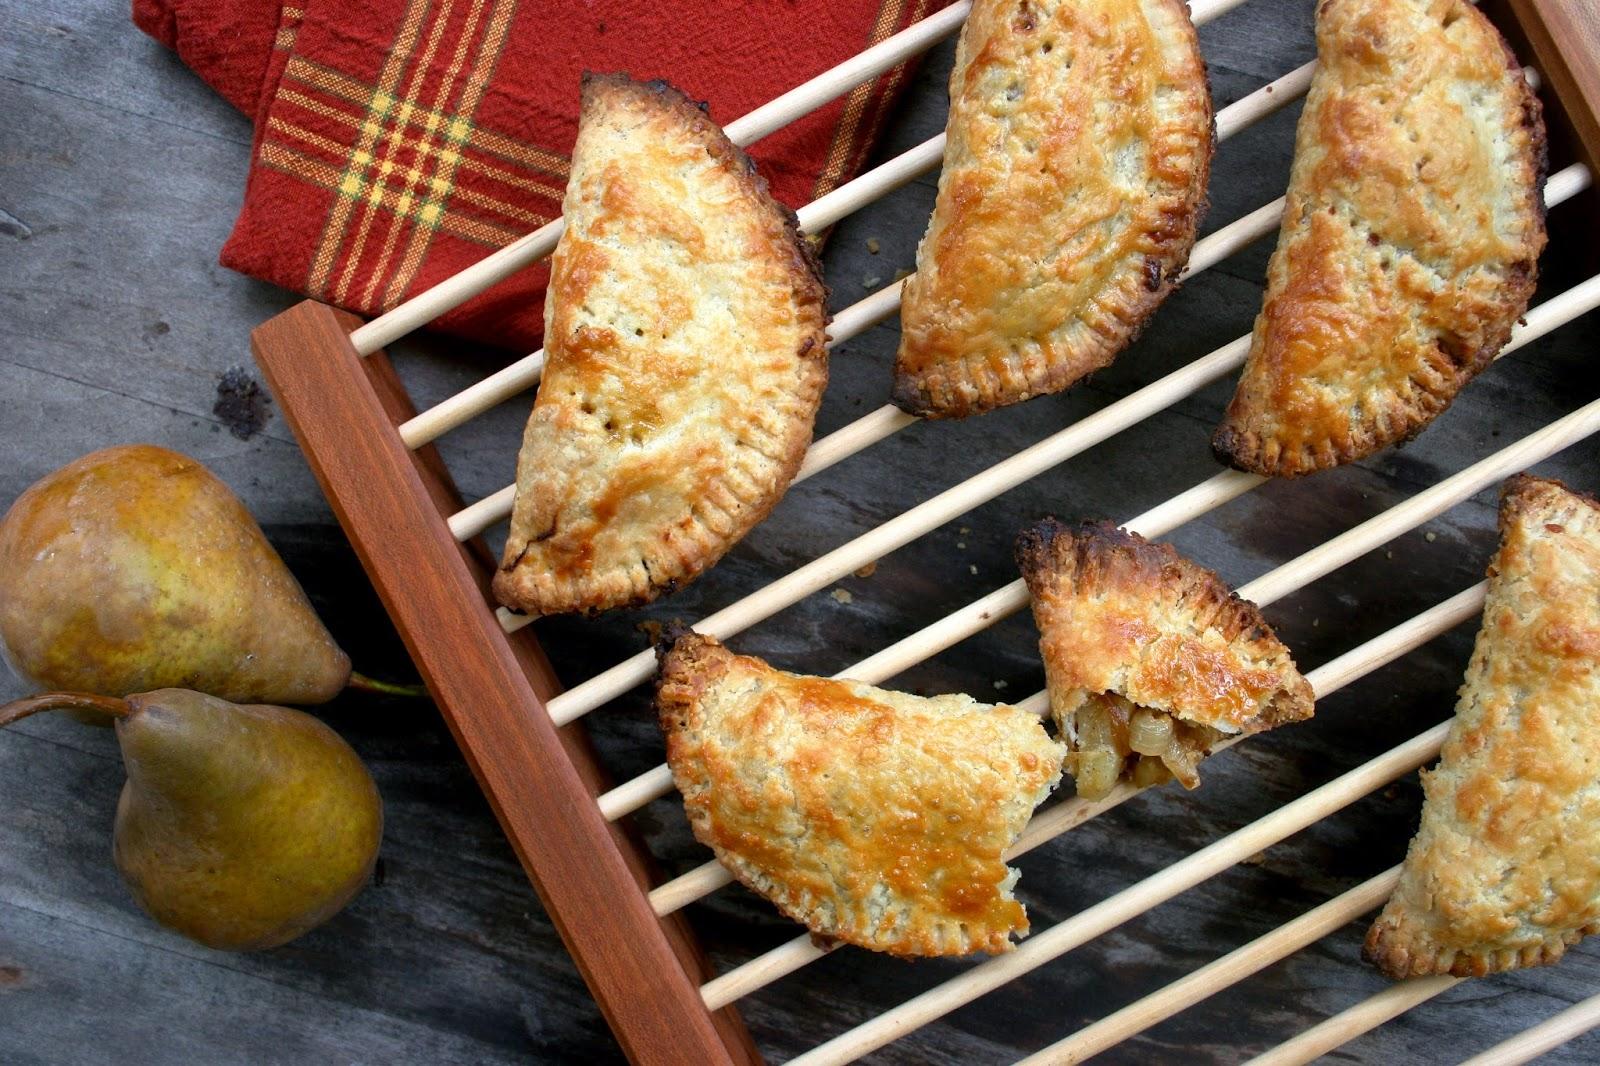 Pear, Gruyere & Caramelized Onion Hand Pies